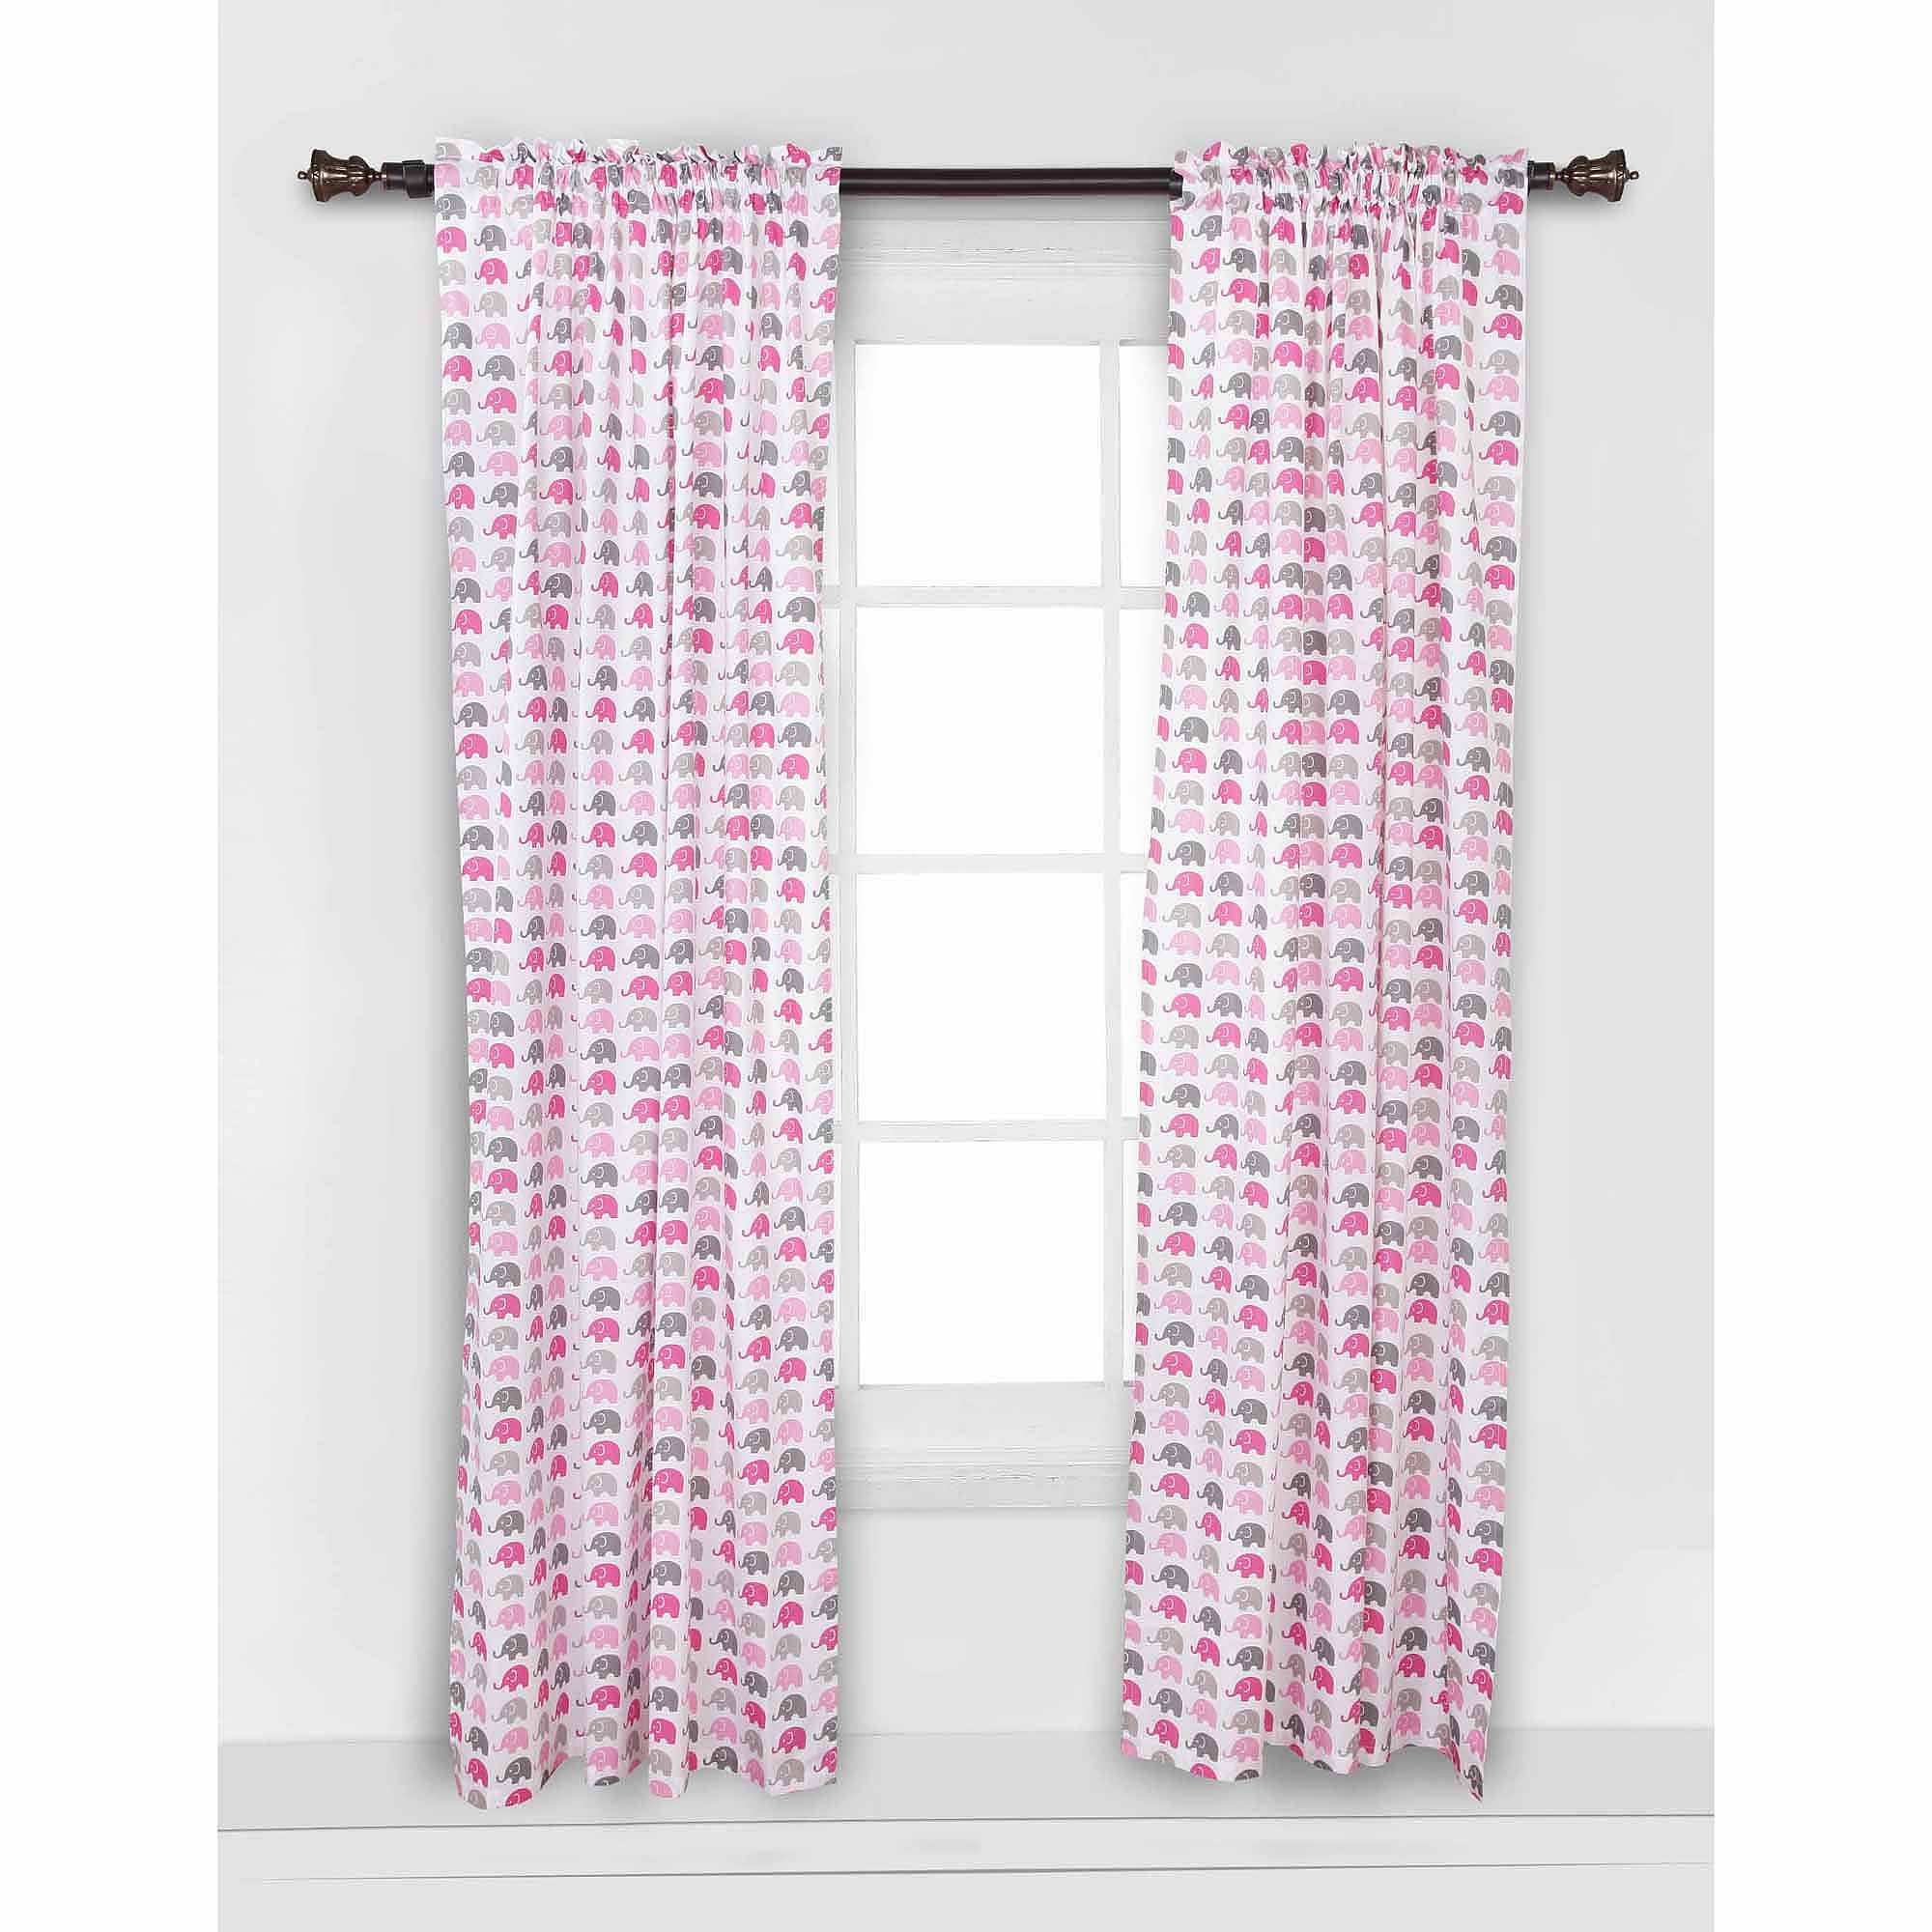 Bacati - Mini Elephants Curtain Panel 42 x 84 inches 100% Cotton Percale Fabrics, Pink/Gray